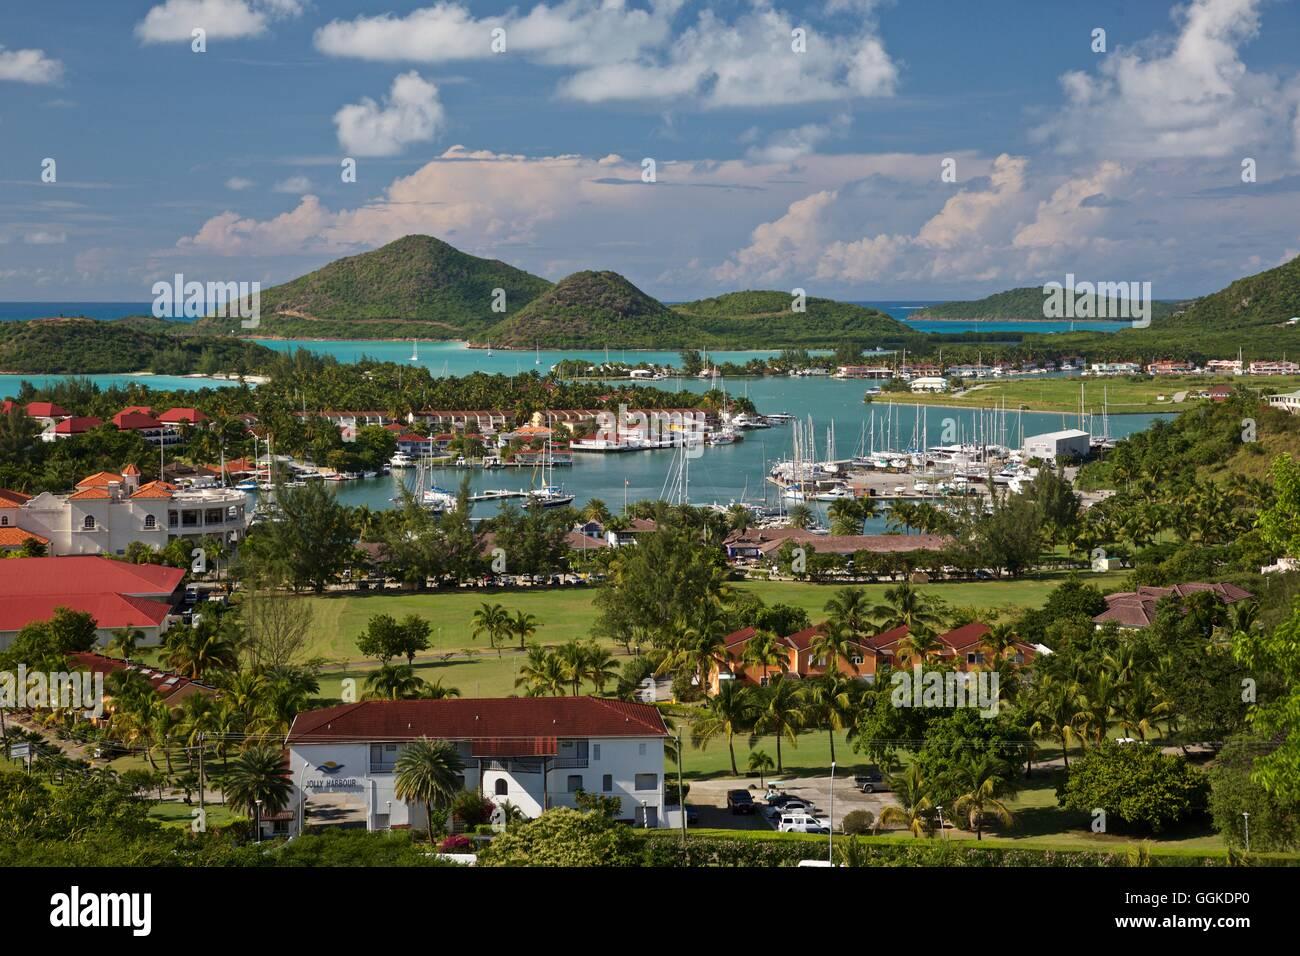 Jolly Harbour, Antigua and Barbuda, Leeward Antilles, Lesser Antilles, Caribbean - Stock Image